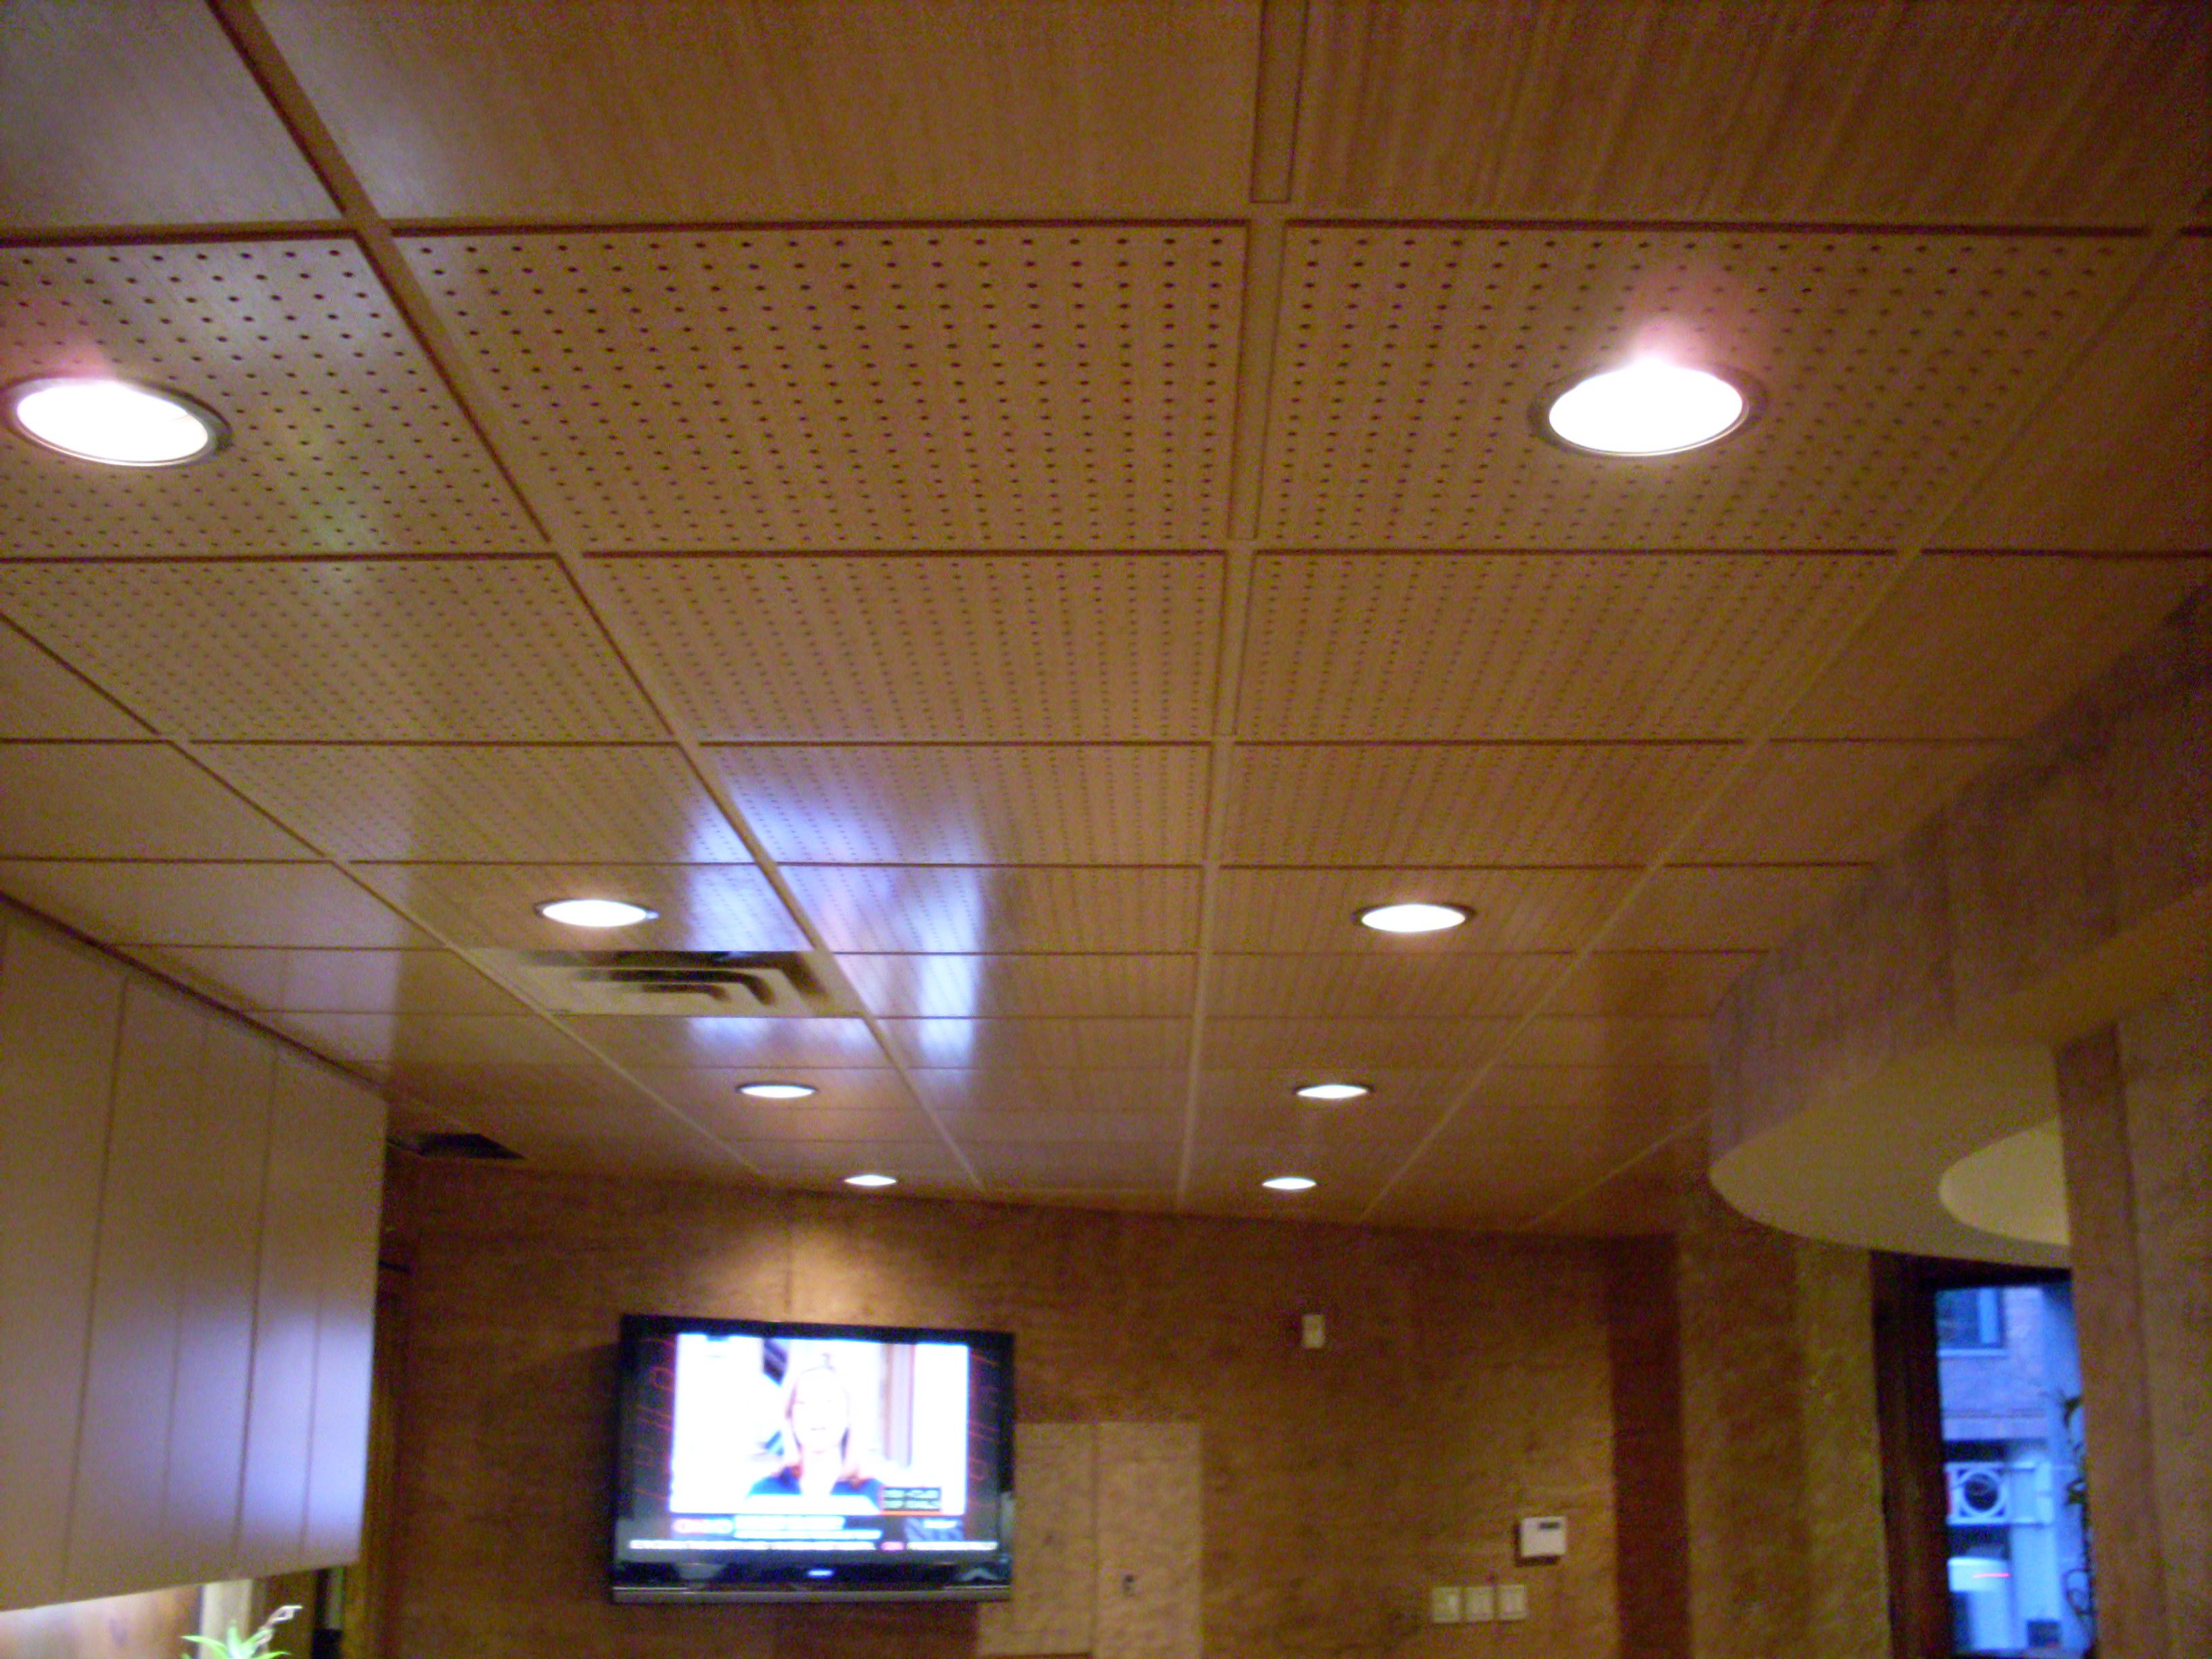 Bamboo Ceiling Tiles Panels Pranksenders